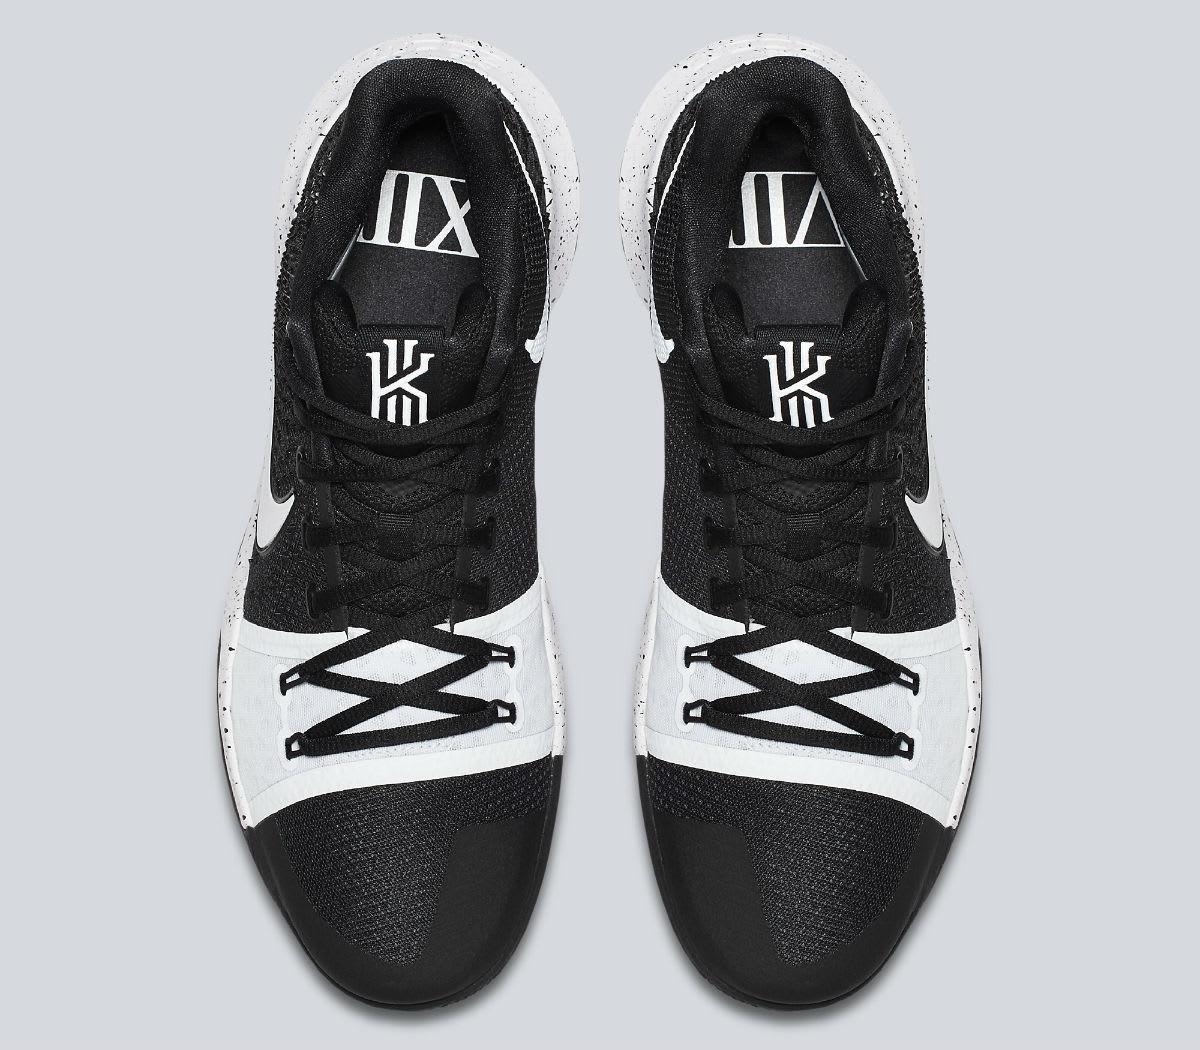 Nike Kyrie 3 Black White Tuxedo Release Date Top 917724-001